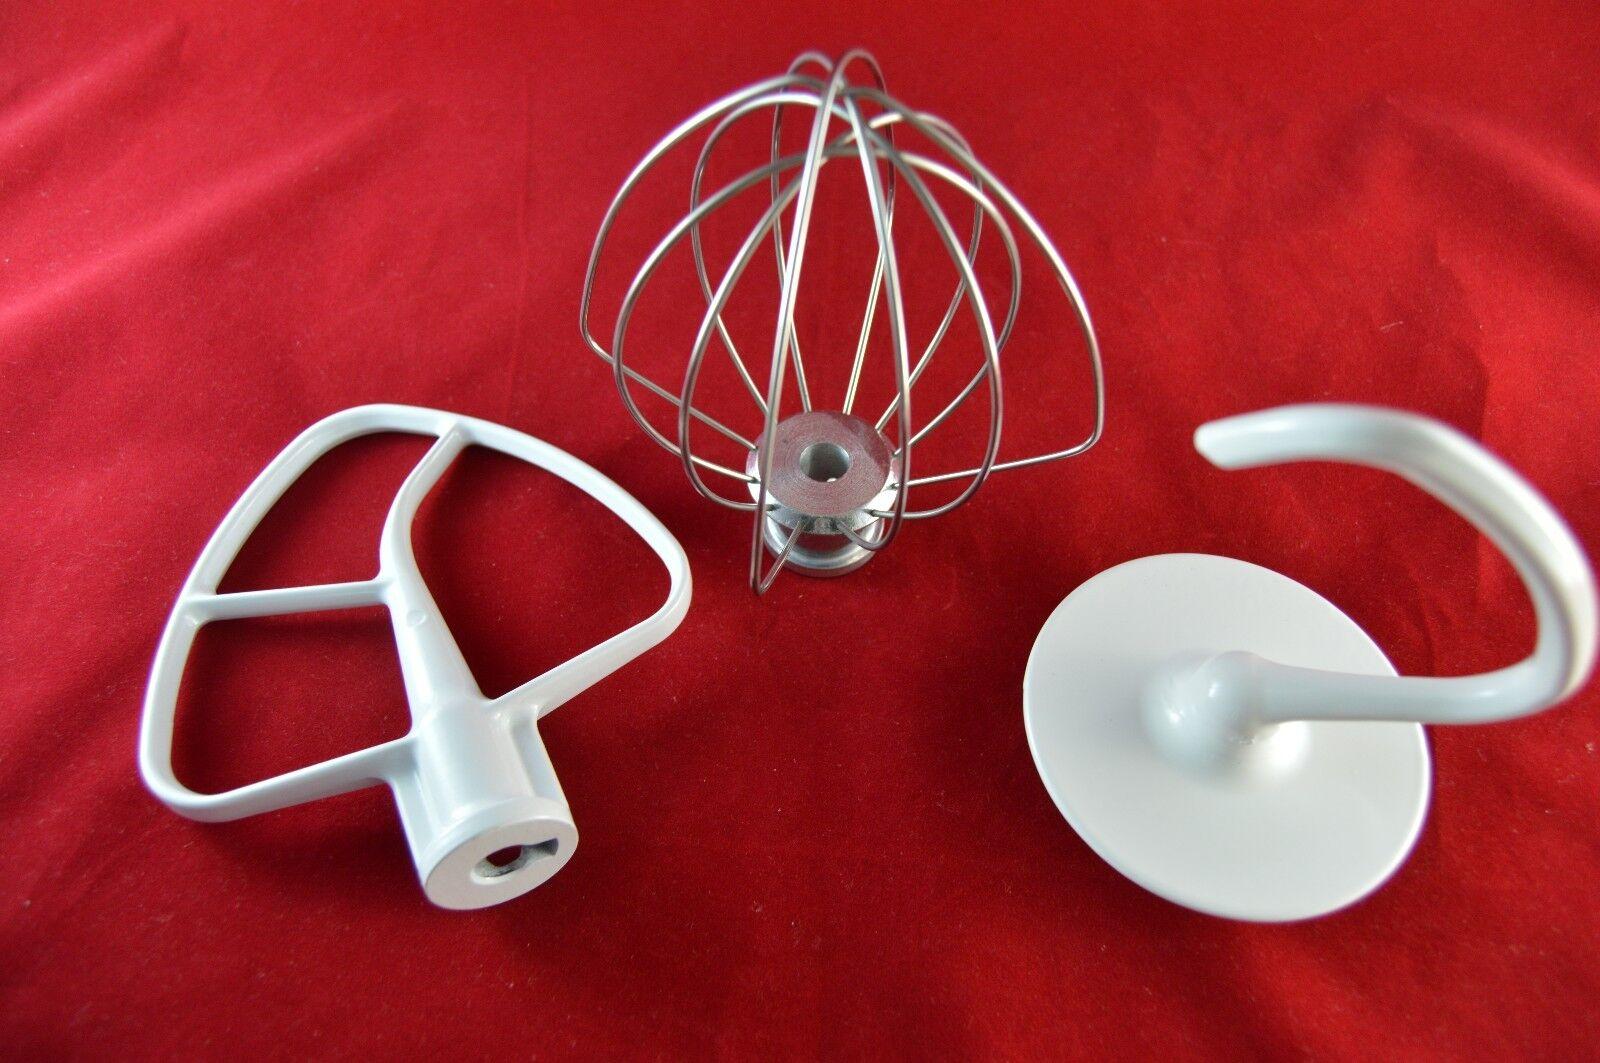 KITCHENAID KSM150 Artisan Mixer Set - Flat Beater, Wire Whip